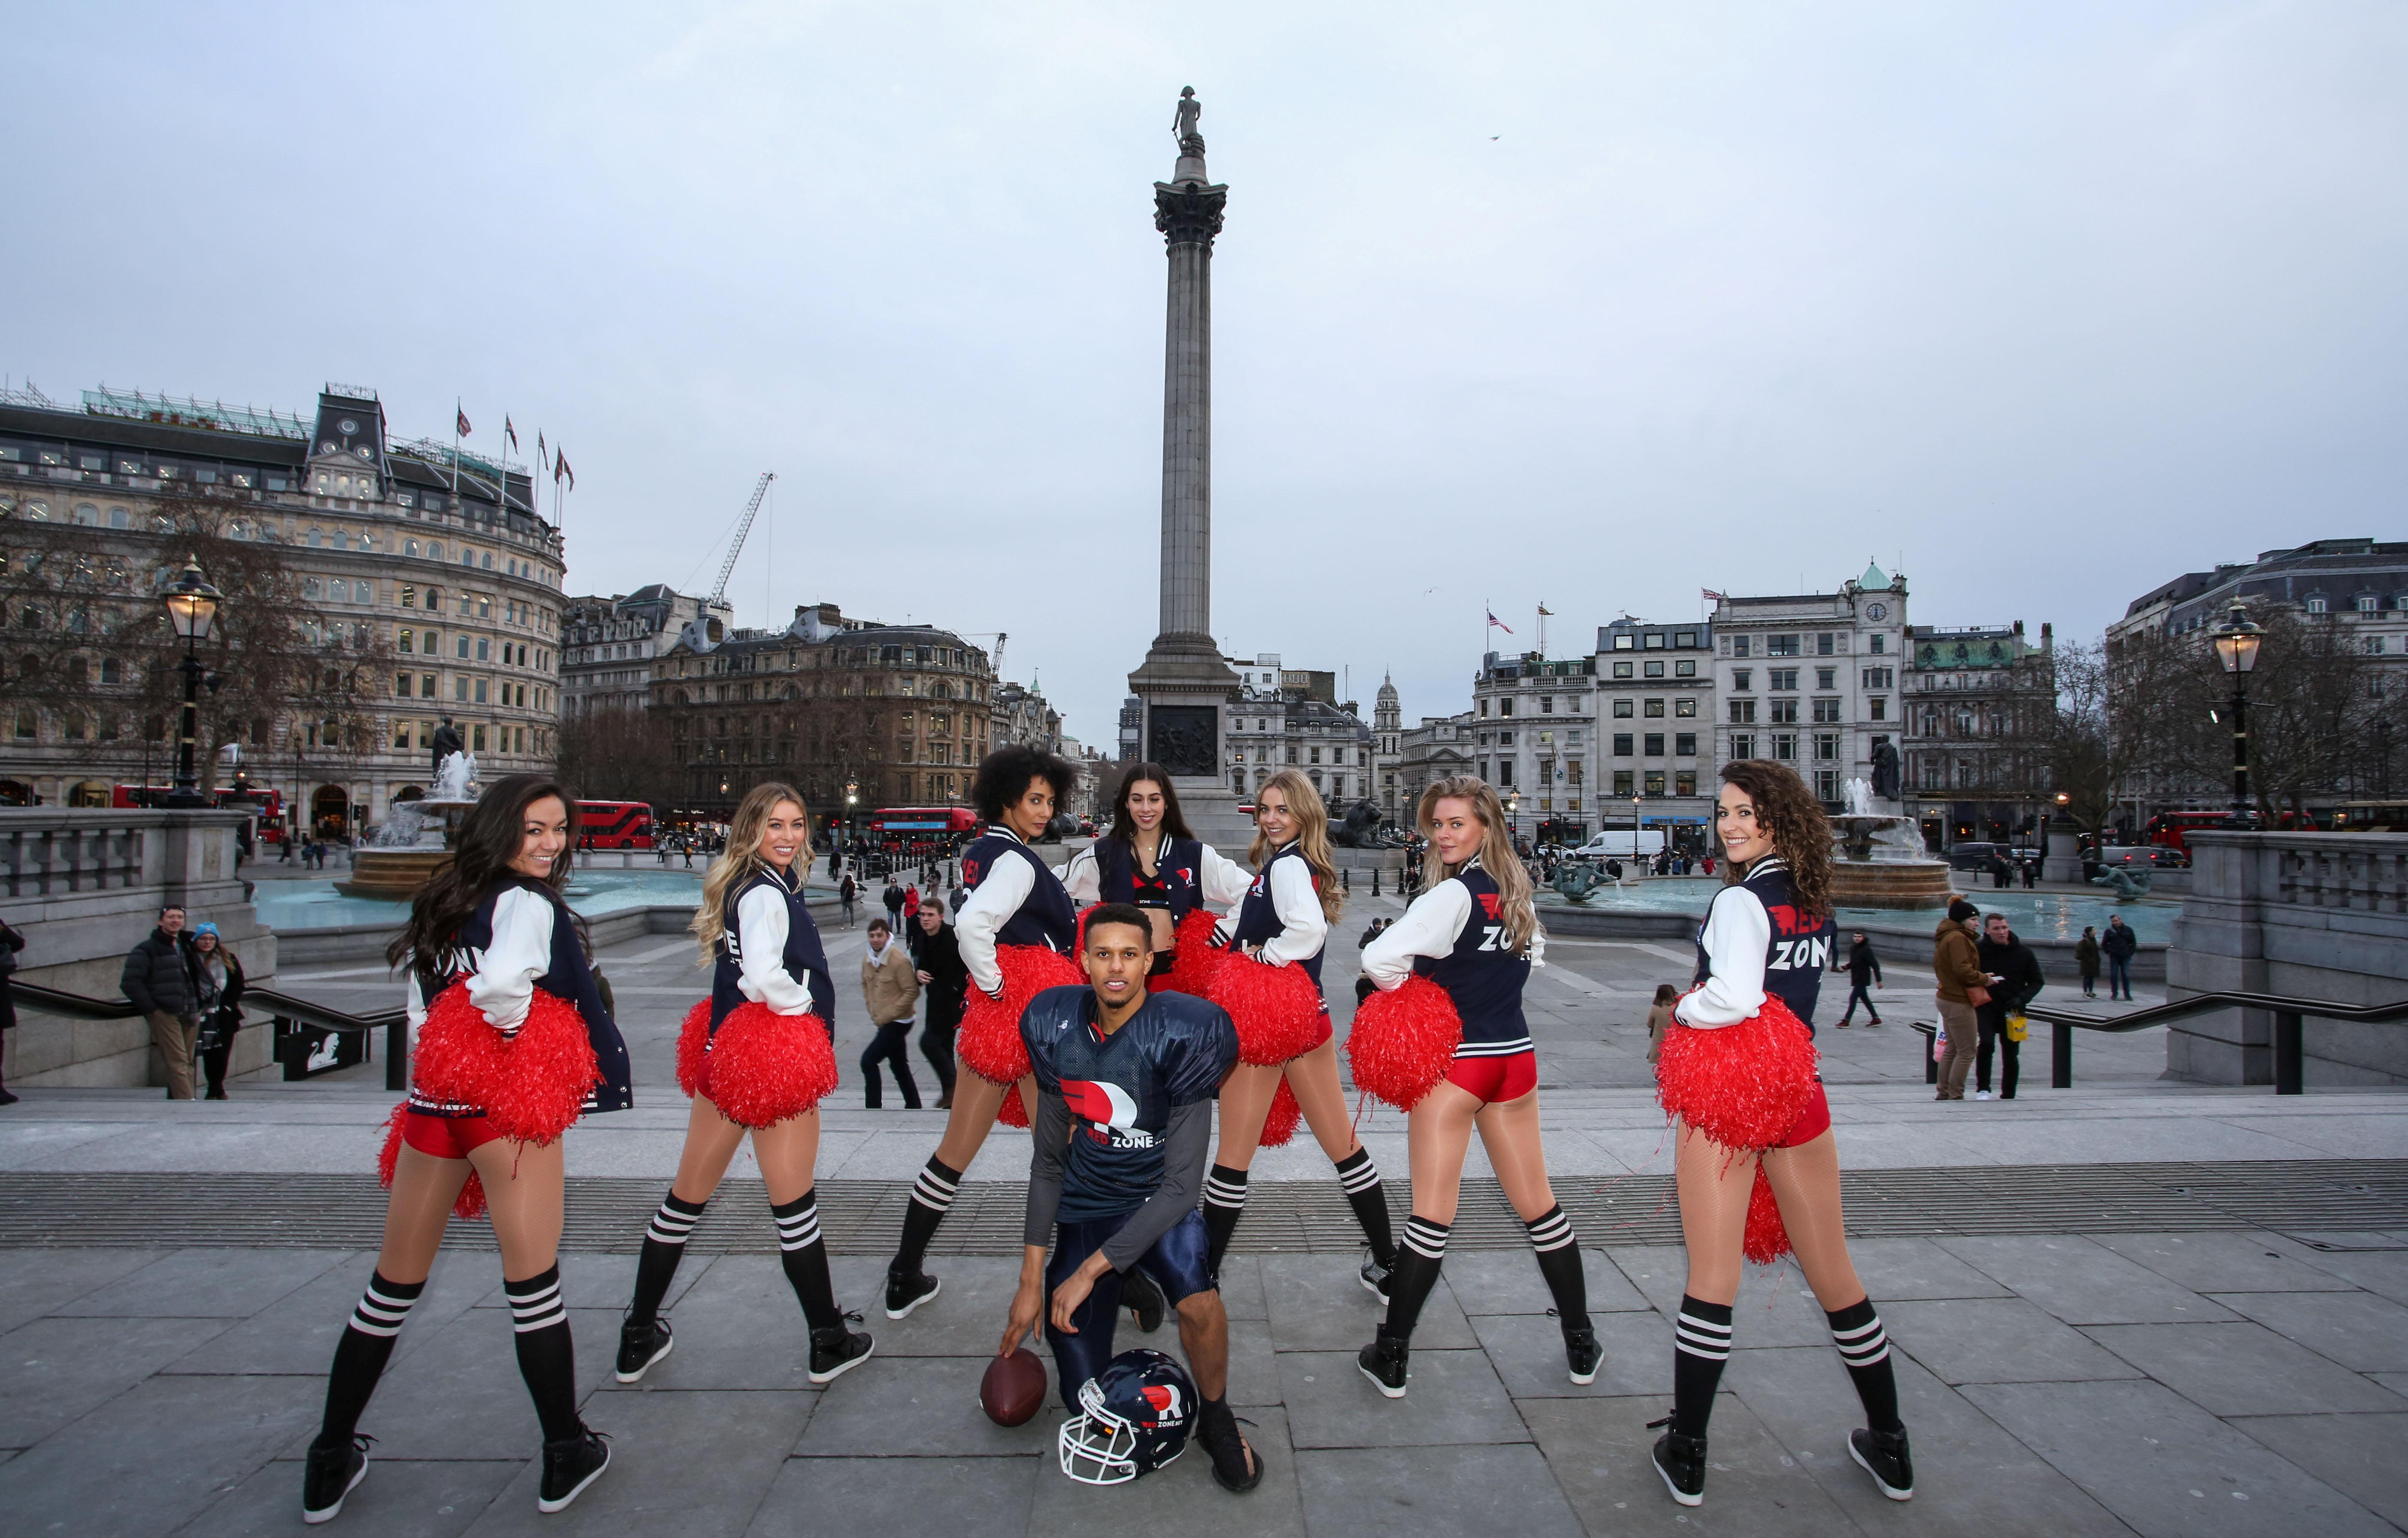 Cheerleaders hit London's tourist attractions on Friday